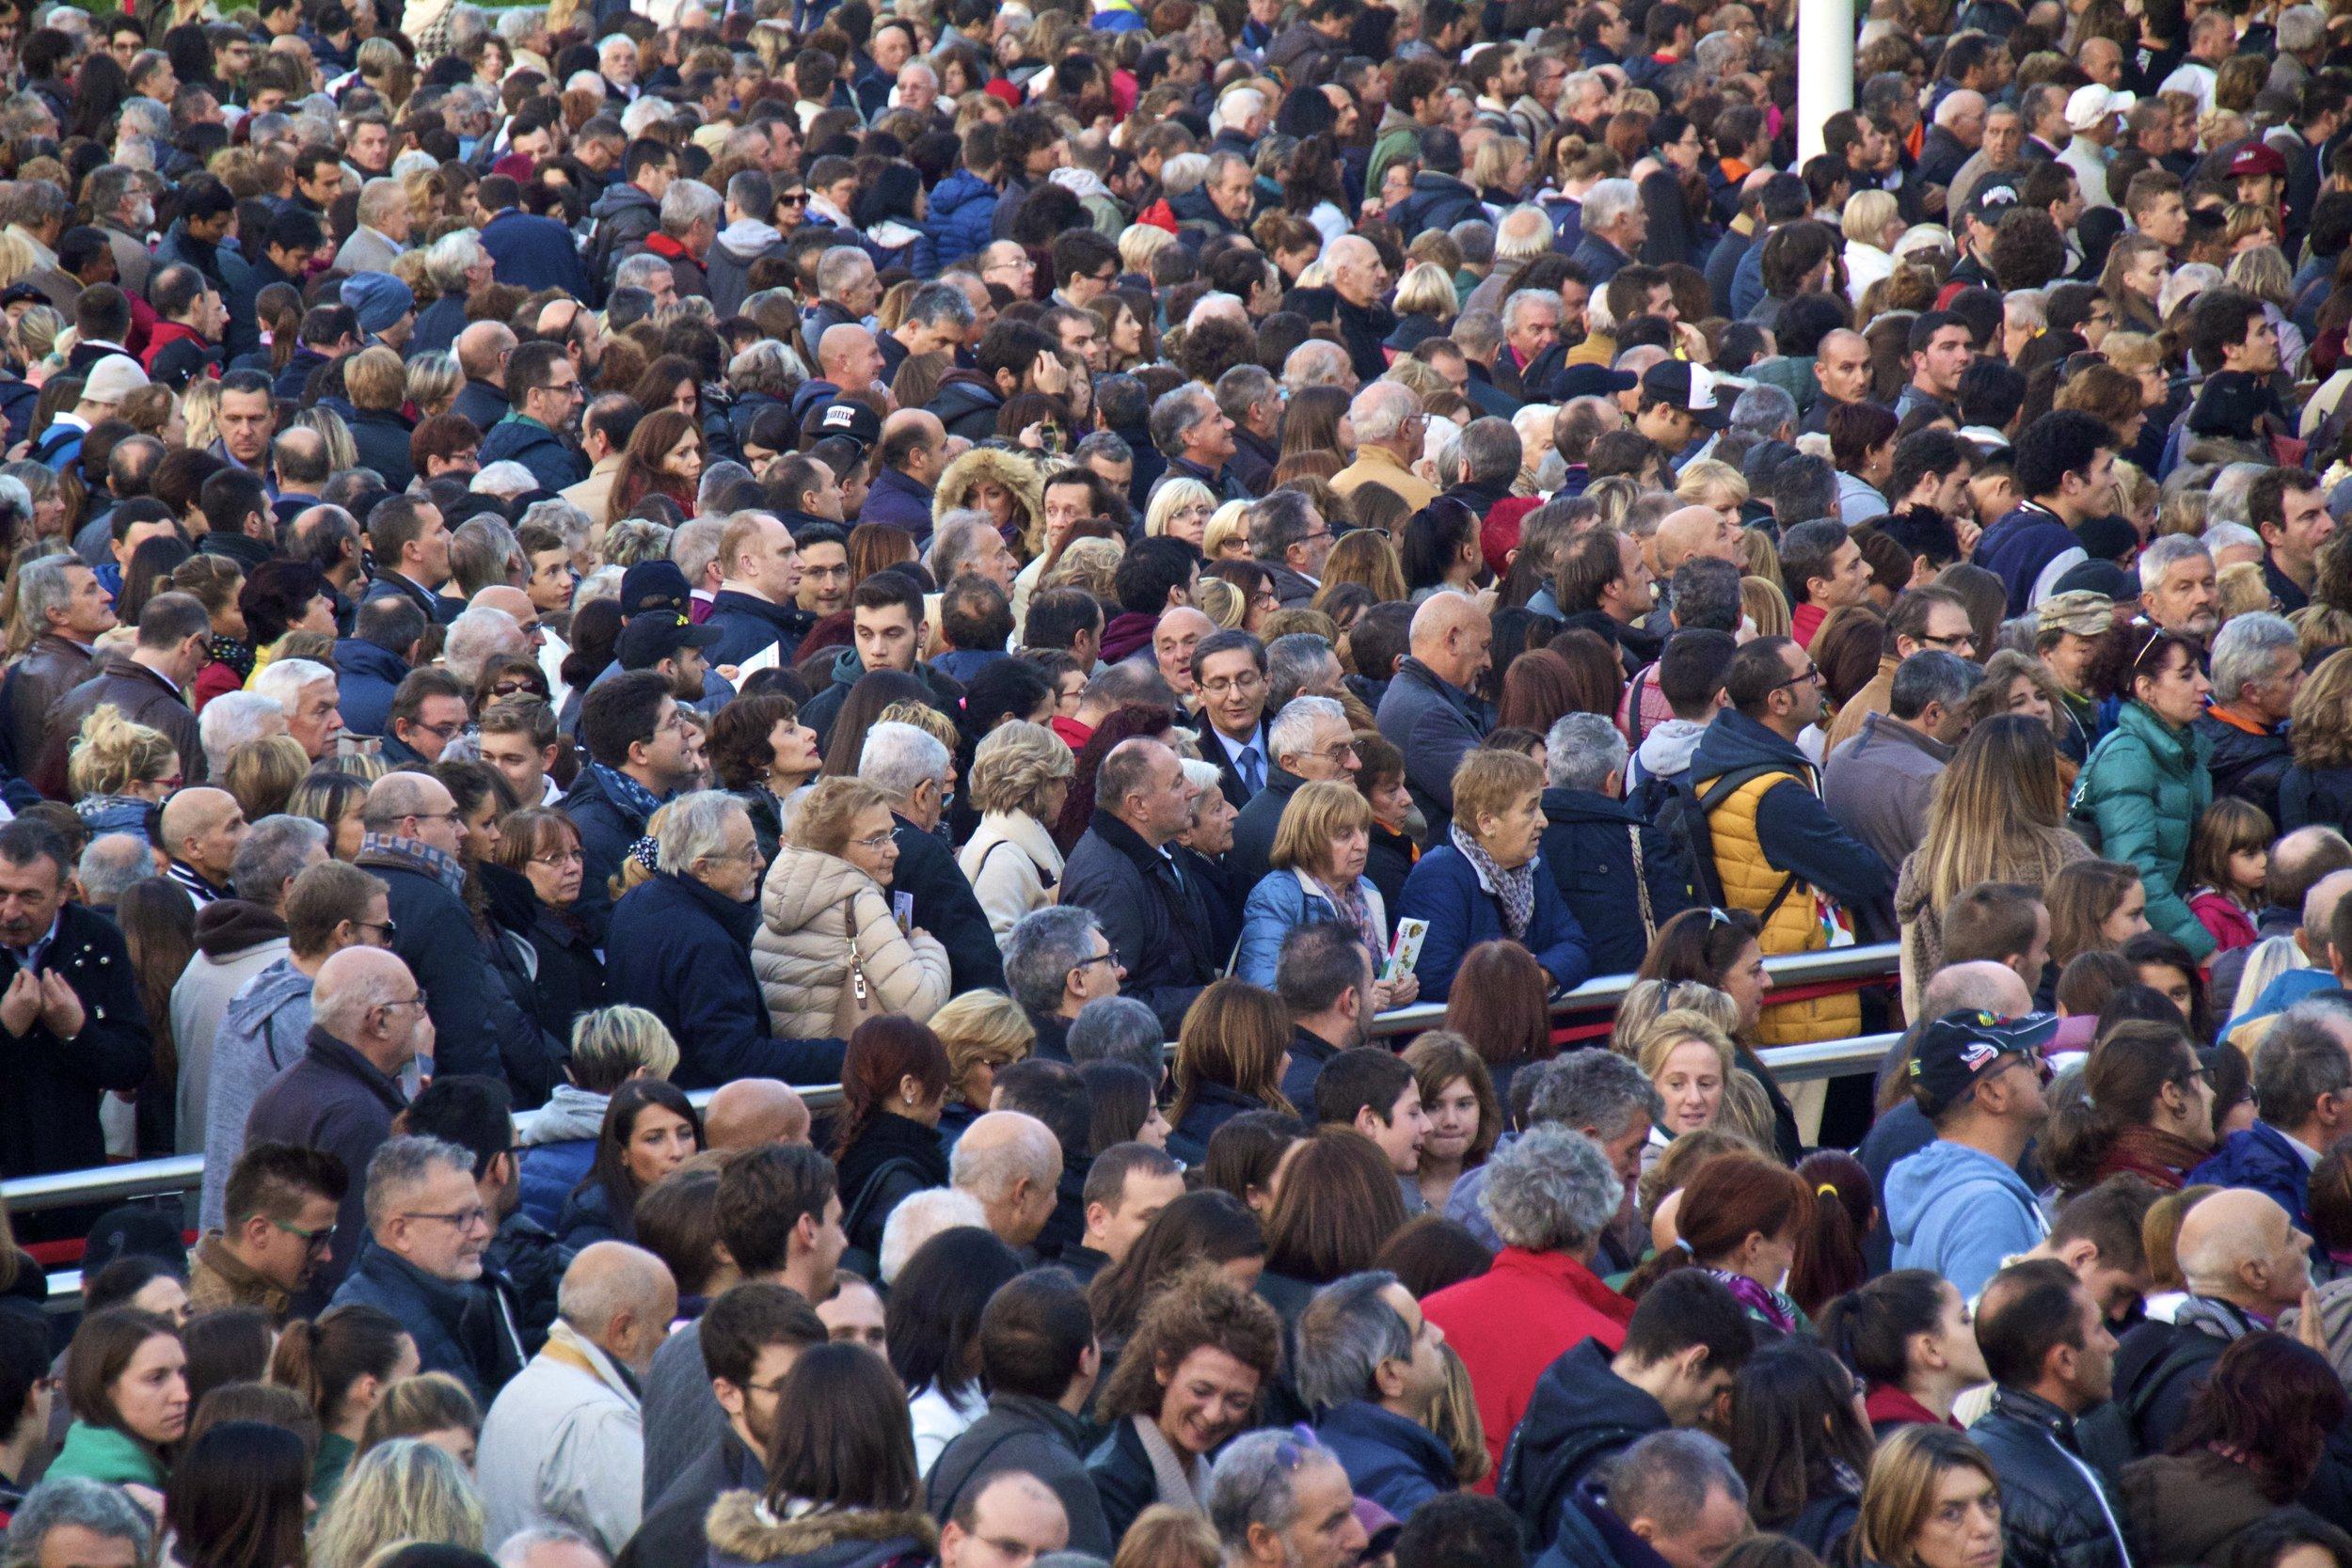 milan milano world expo 2015 1.jpg